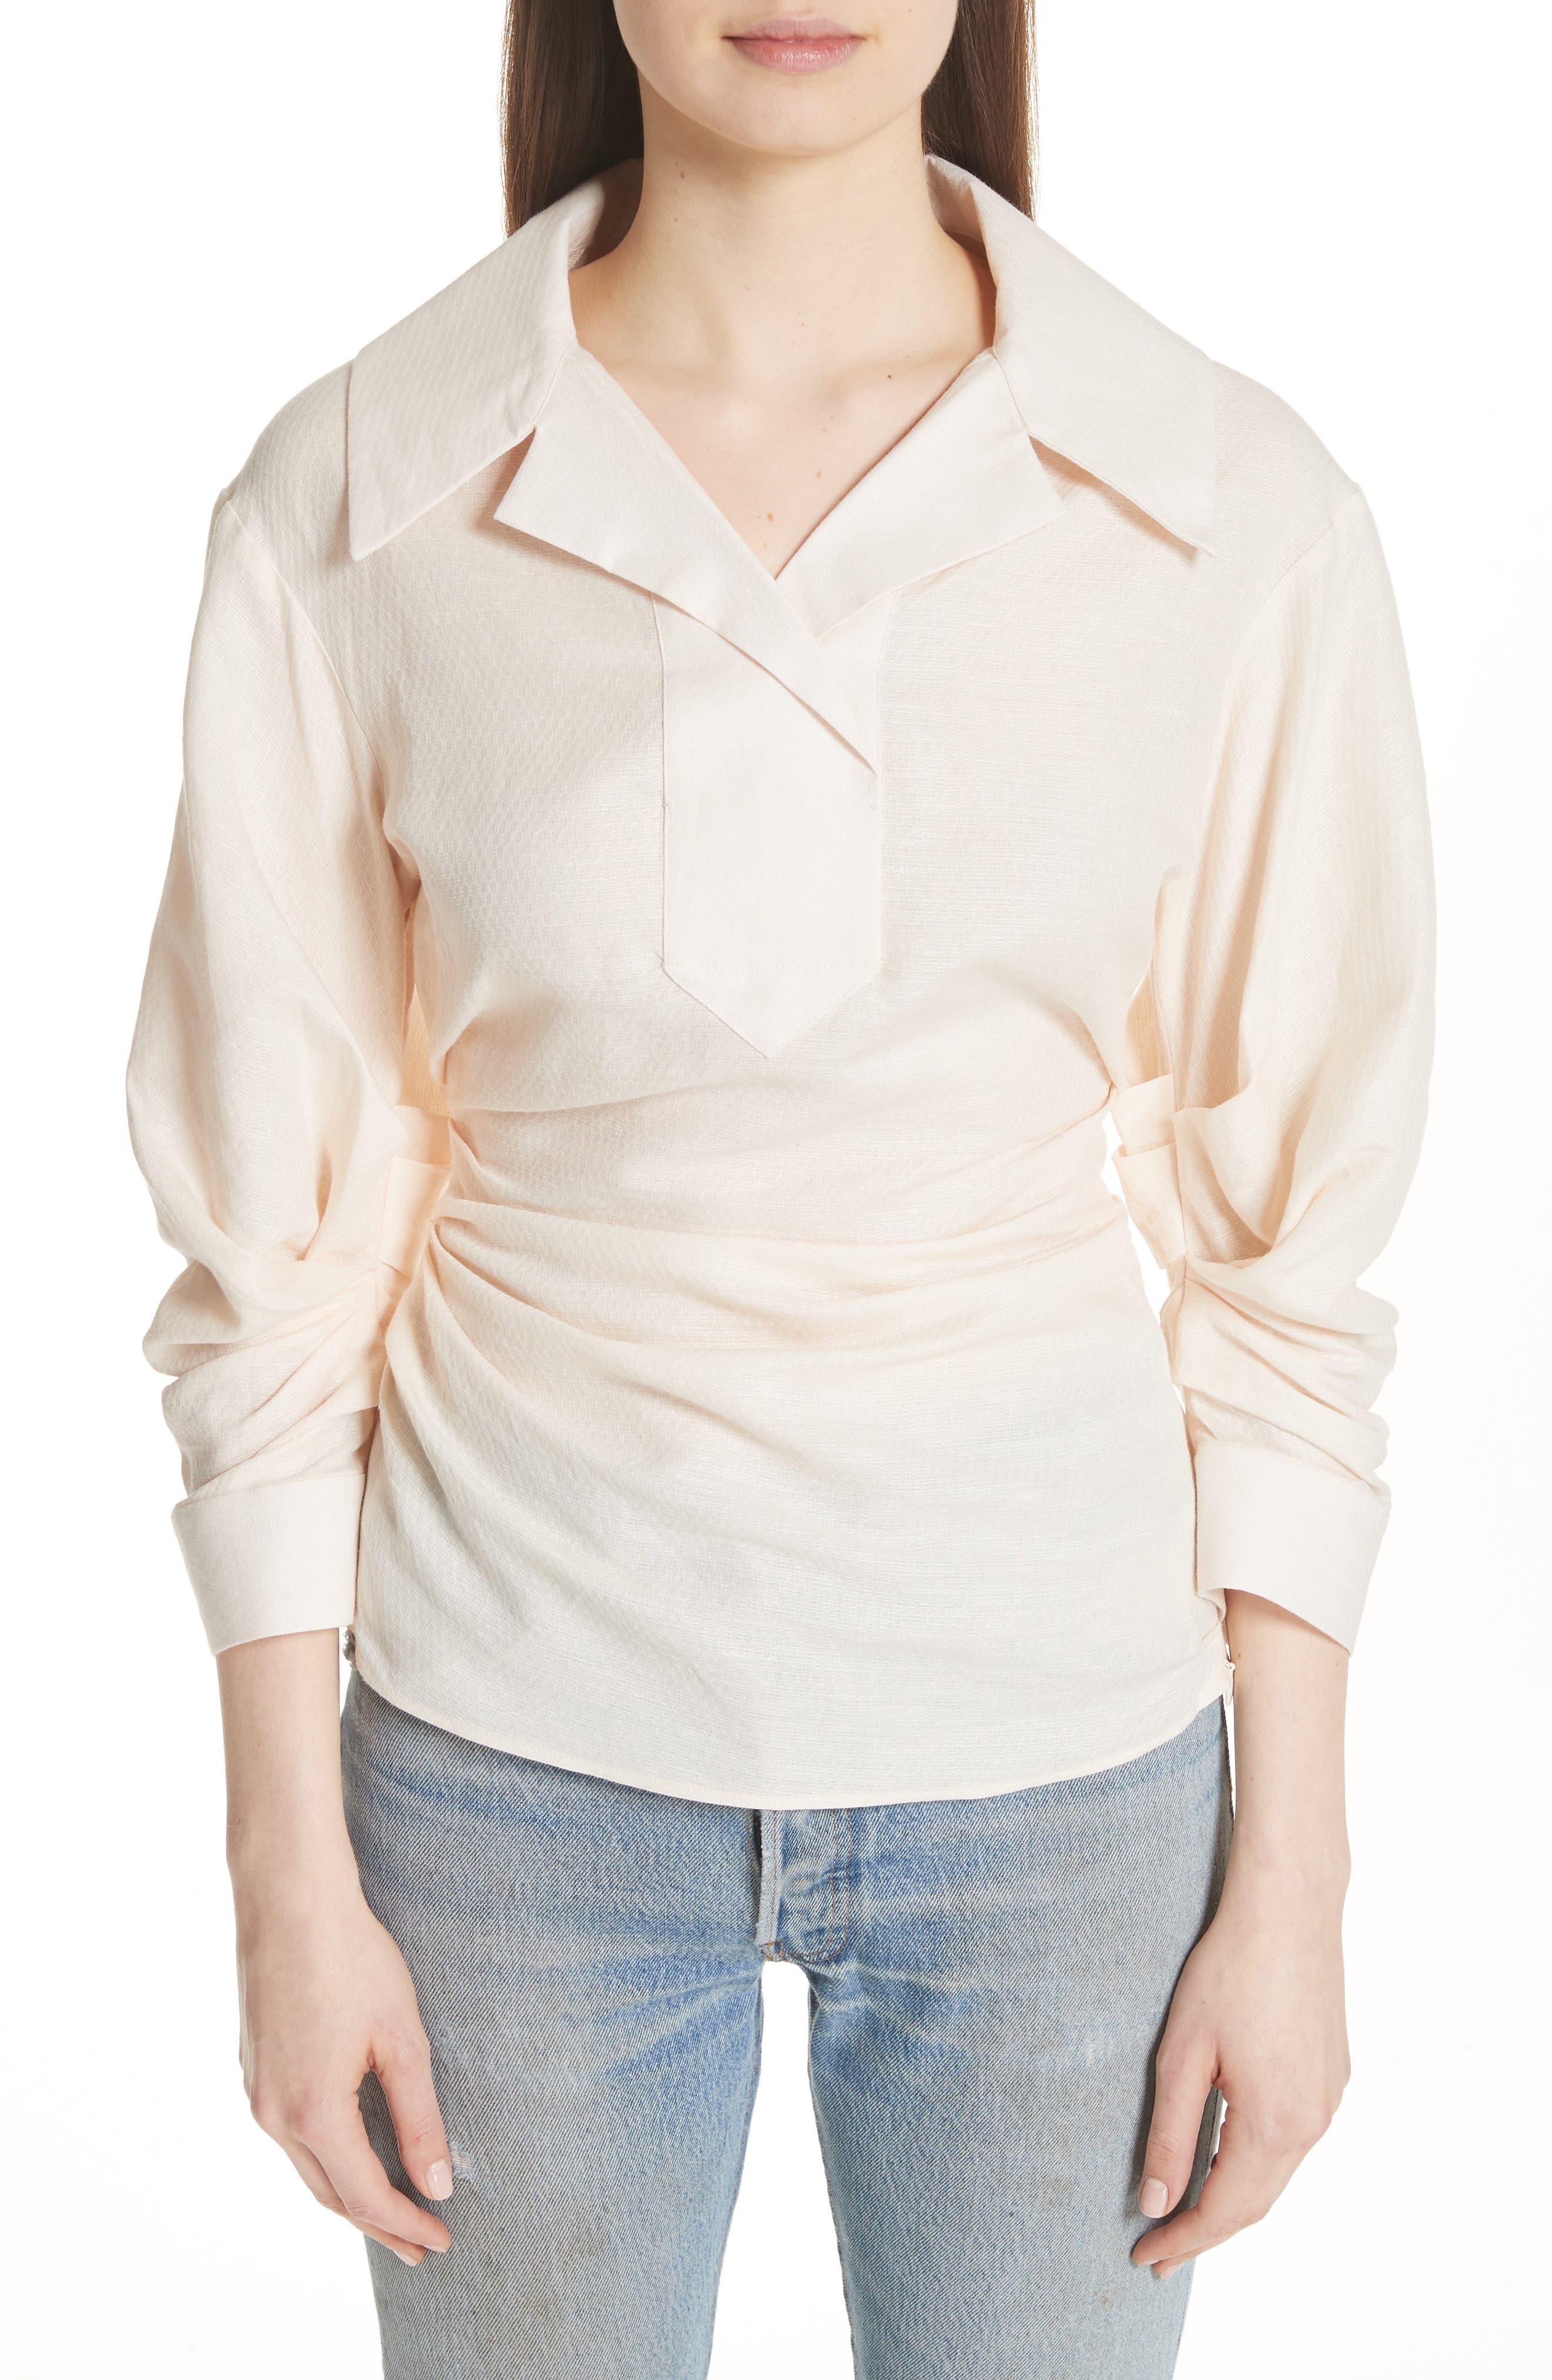 La Chemise Maceio Shirt,                             Main thumbnail 1, color,                             250